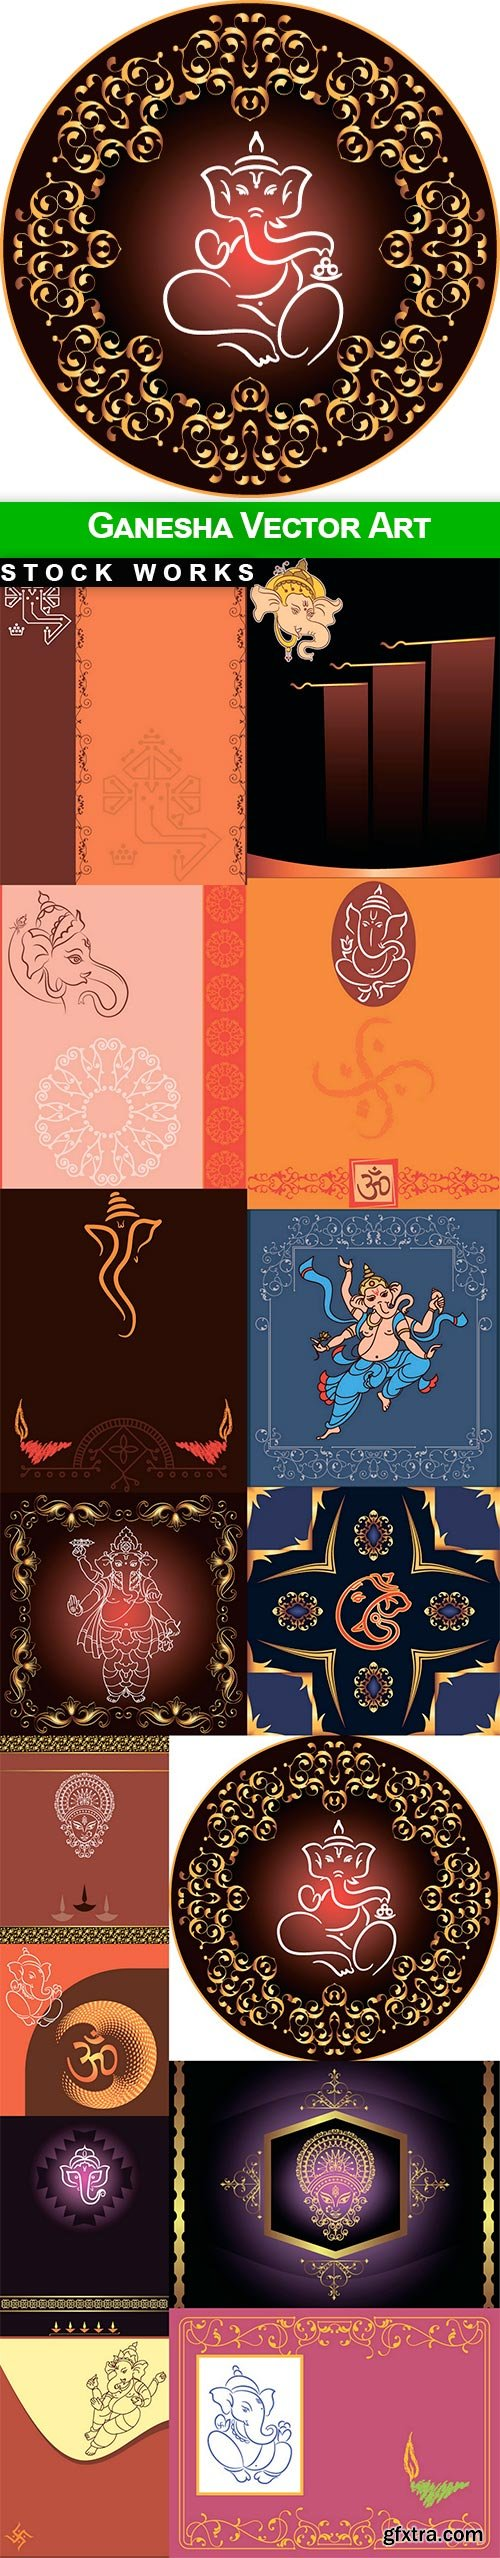 Ganesha Vector Art - 15 EPS